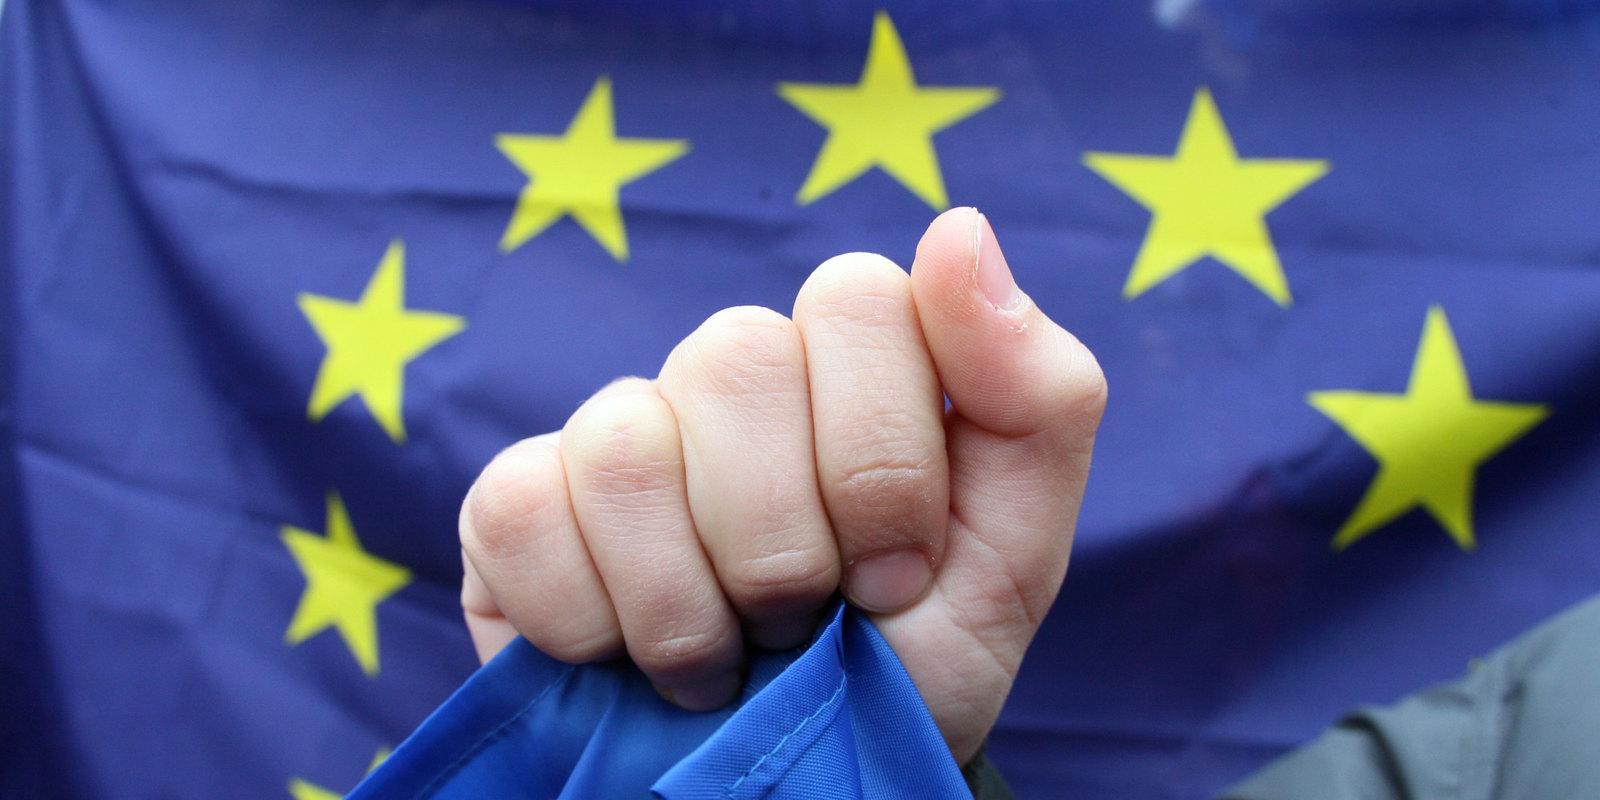 UKRAINE-EU-OPPOSITION-PROTEST